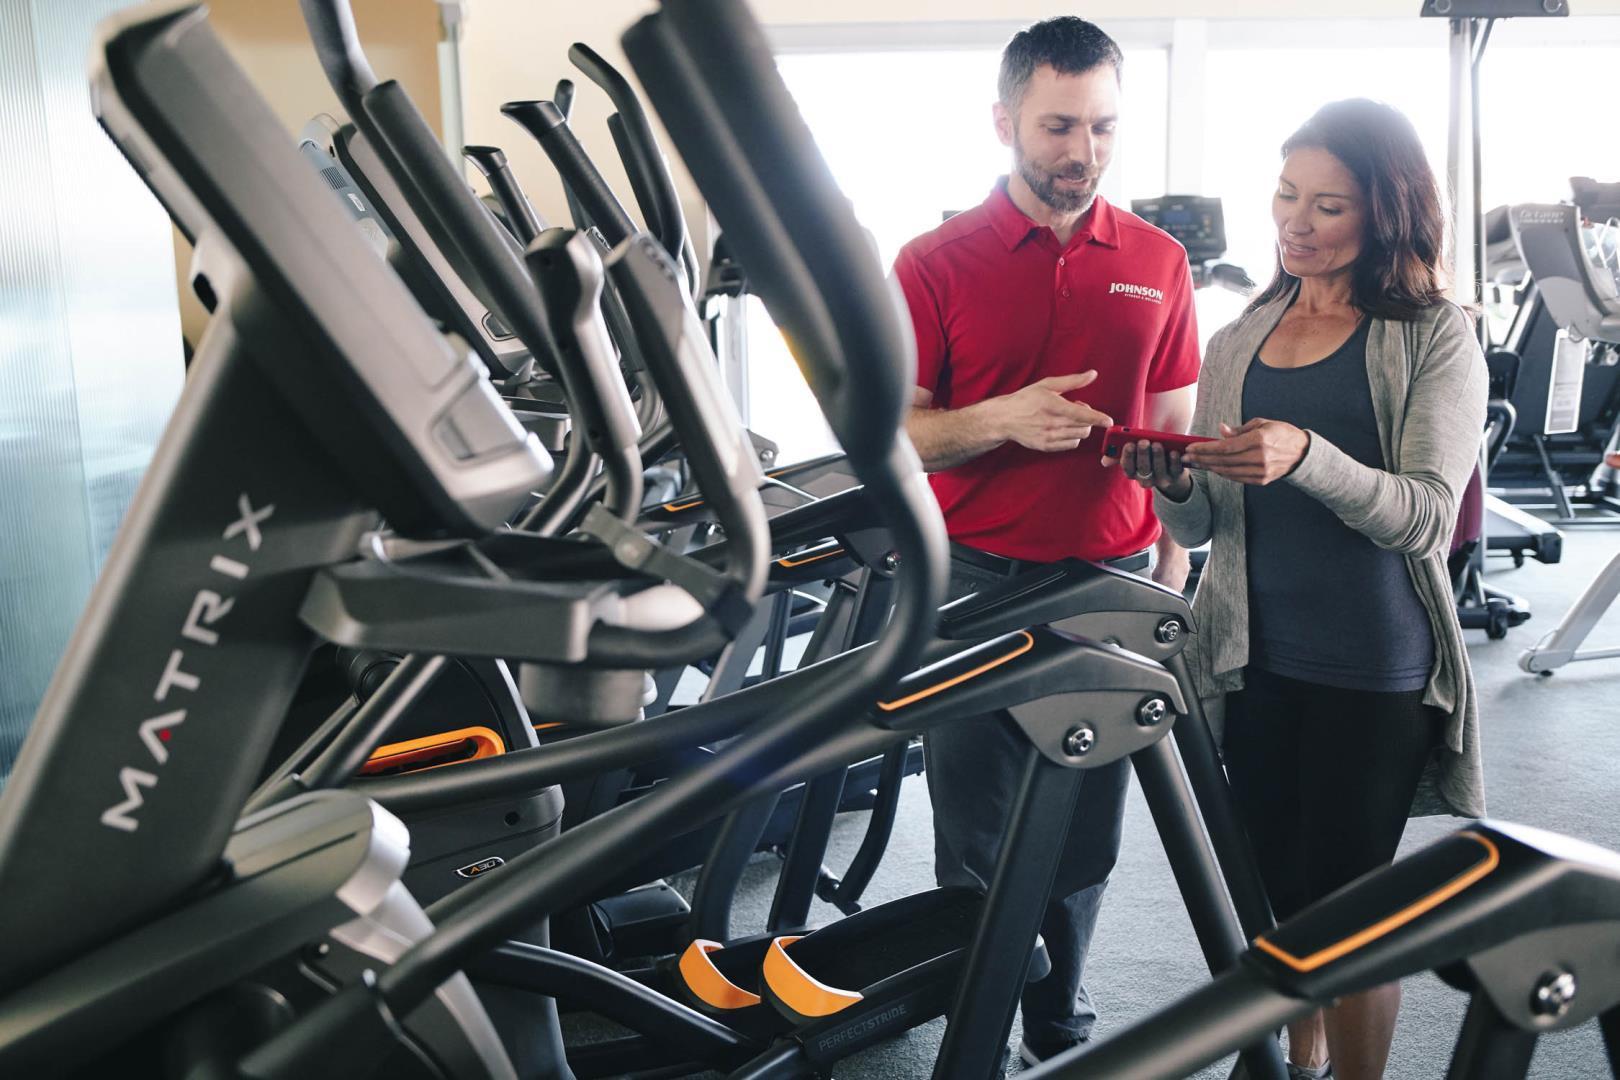 Johnson Fitness & Wellness - Geneva, IL - Opening Soon